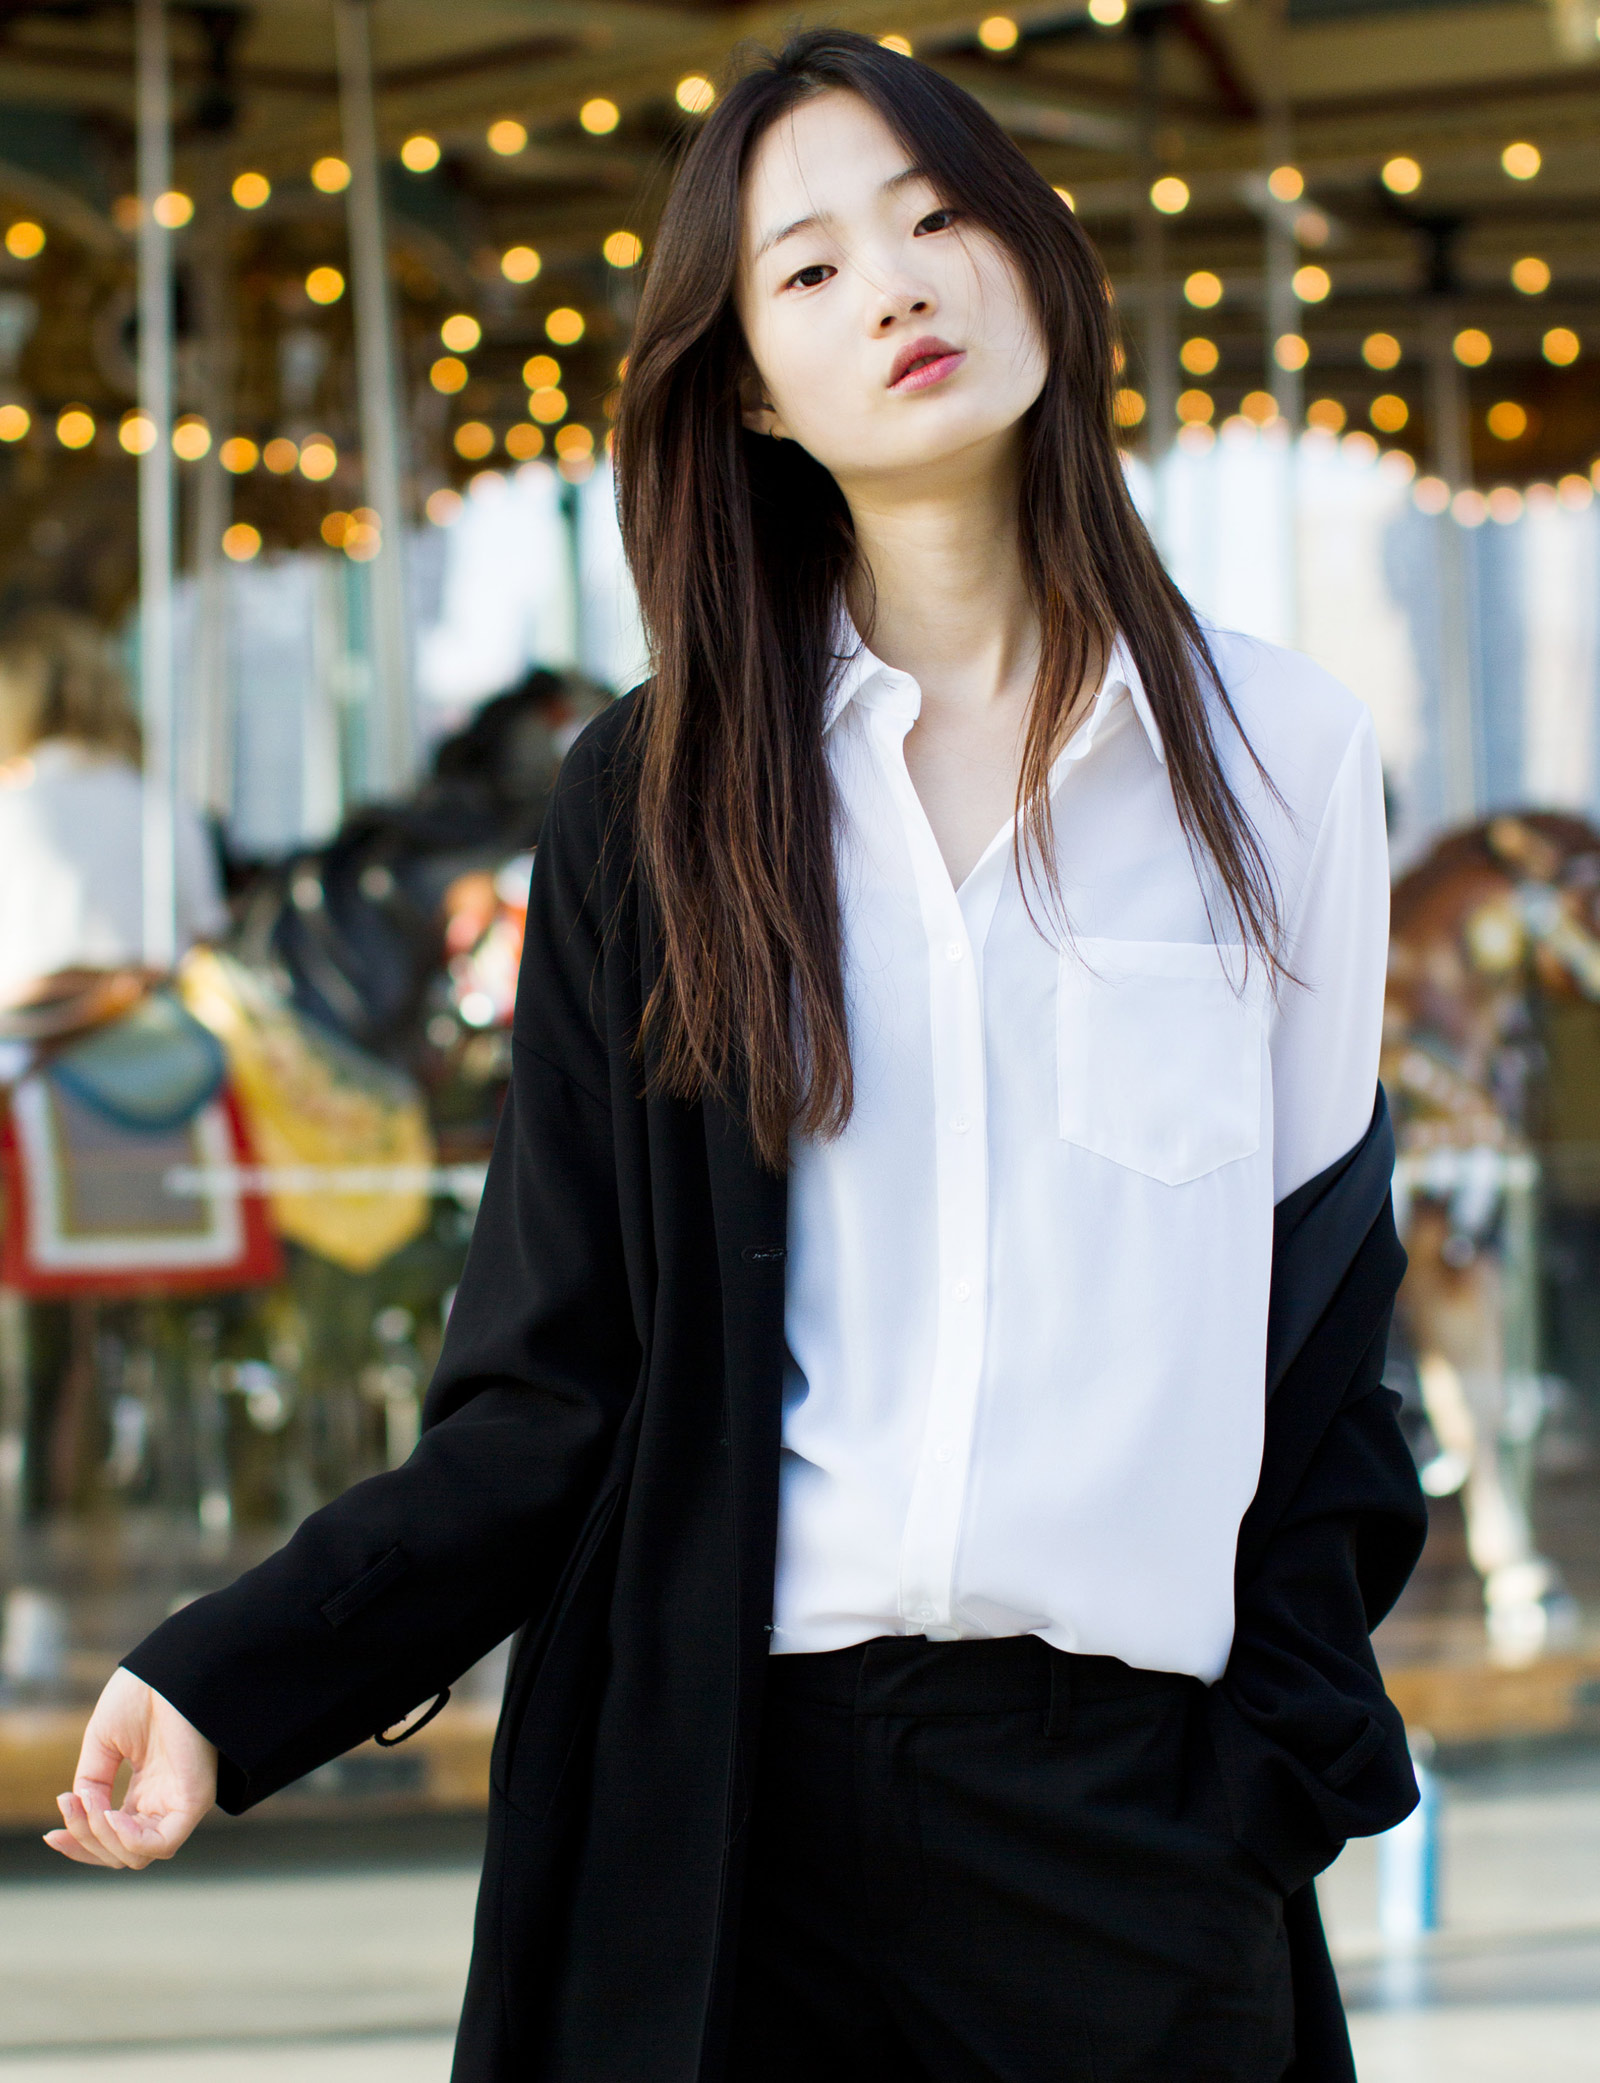 TheFappening Hyun Ji Shin nudes (89 photo), Topless, Hot, Twitter, legs 2020